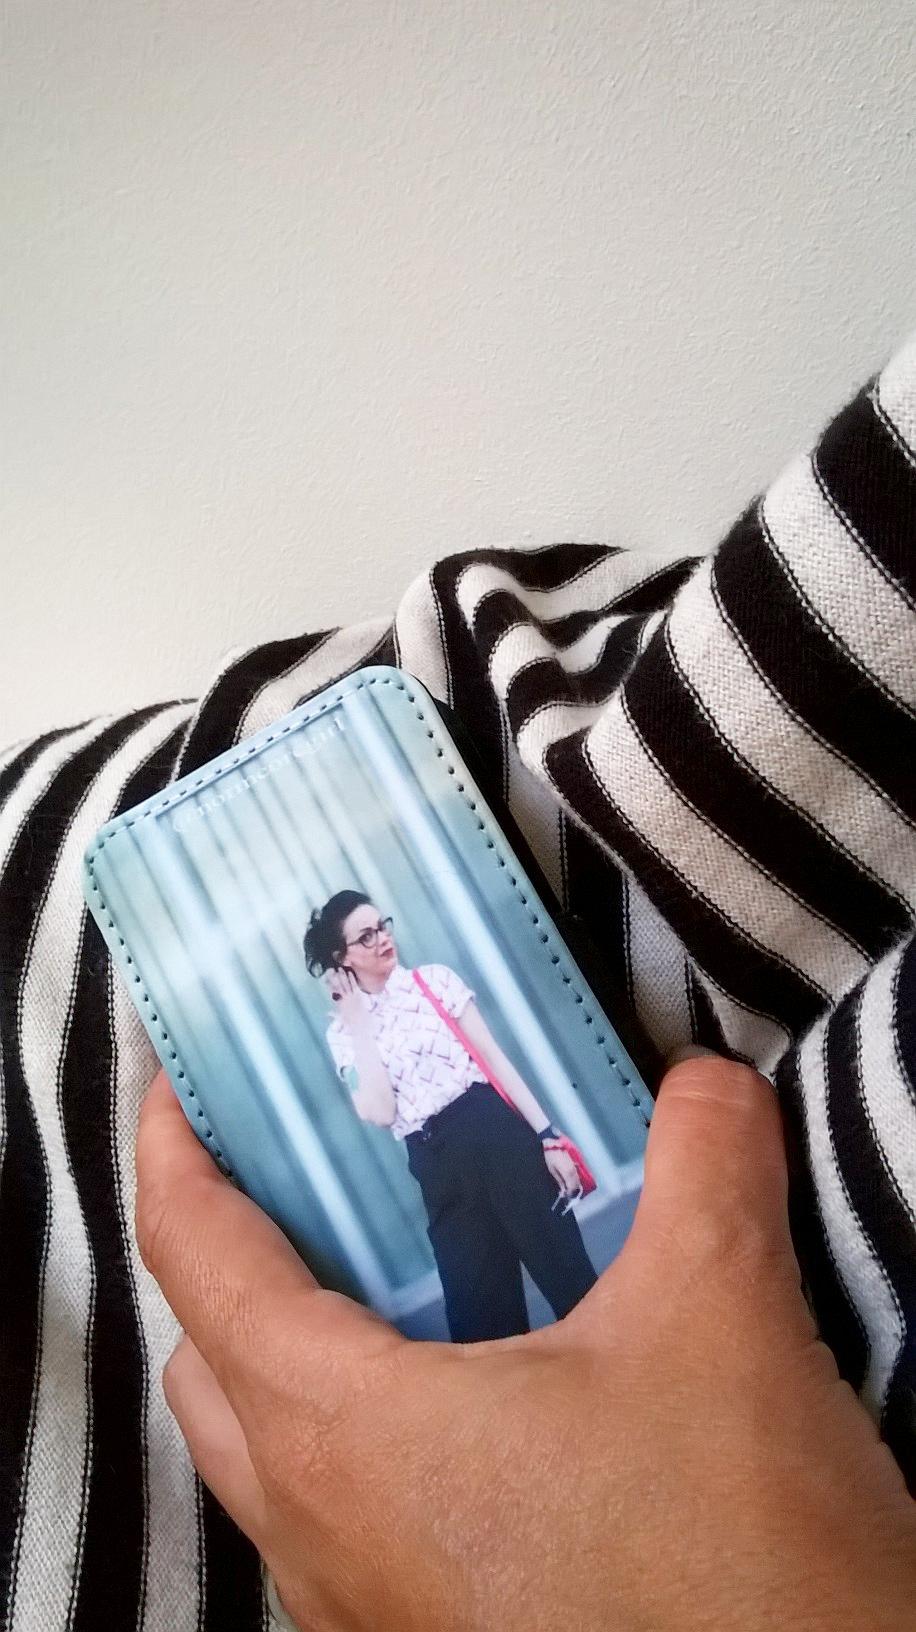 iphone cover gocustomized normcoregirl influencer spanish blogger